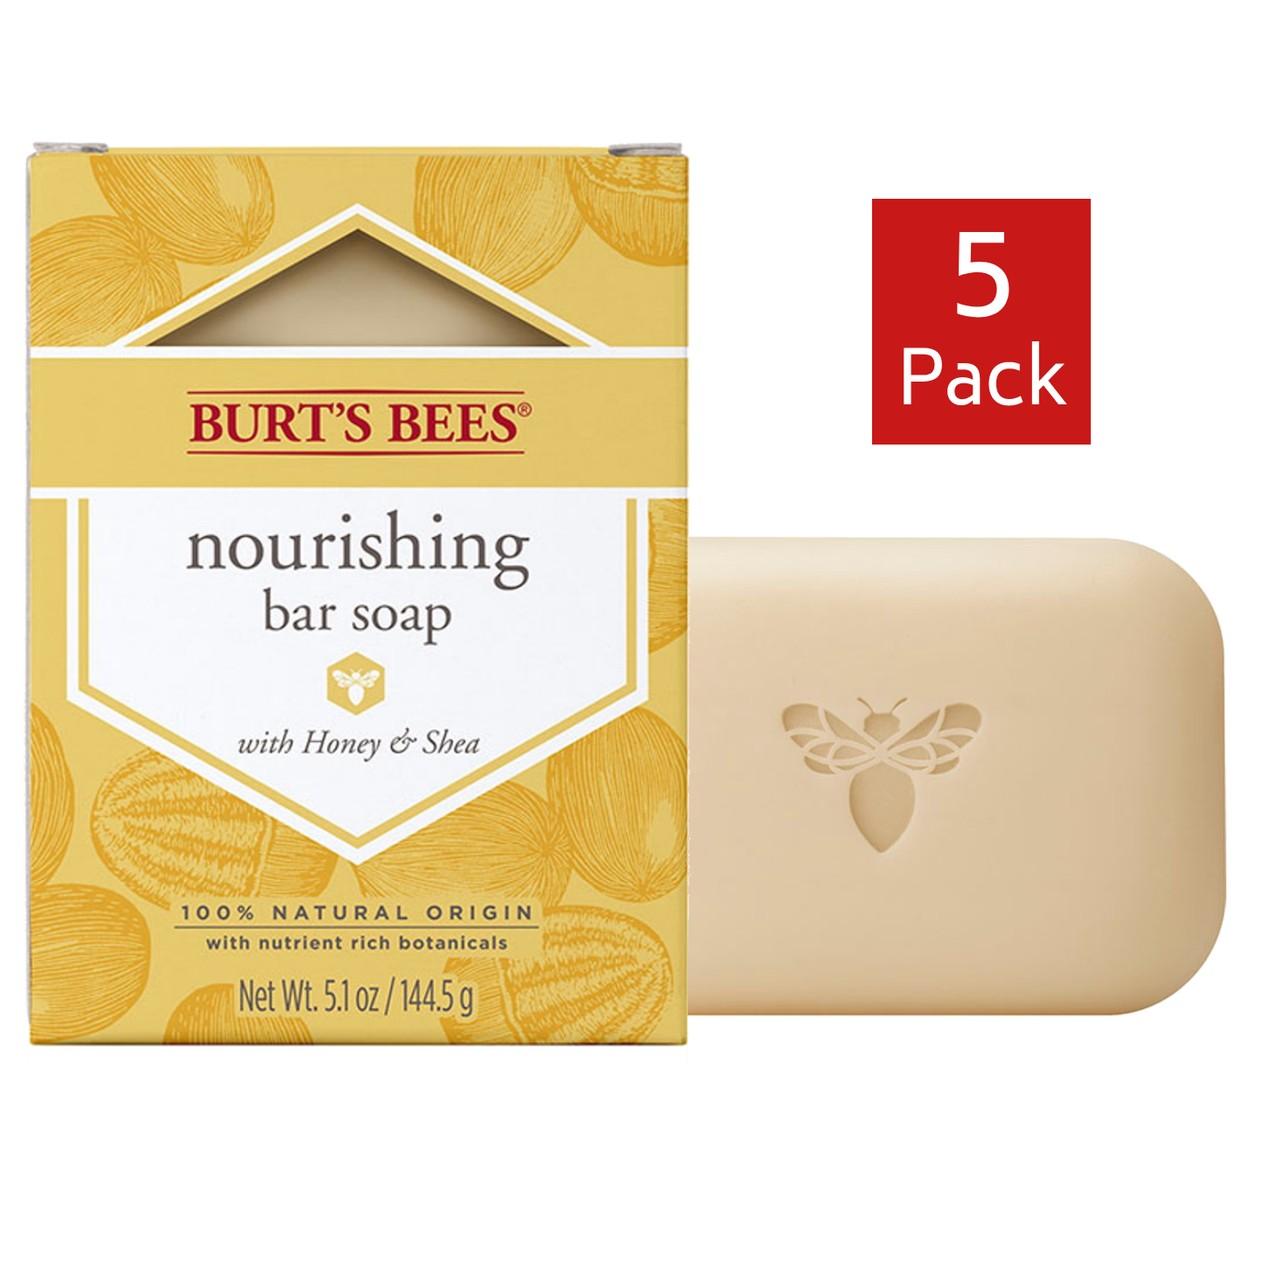 5-Pack Burt's Bees Nourishing Bar Soap with Honey & Shea